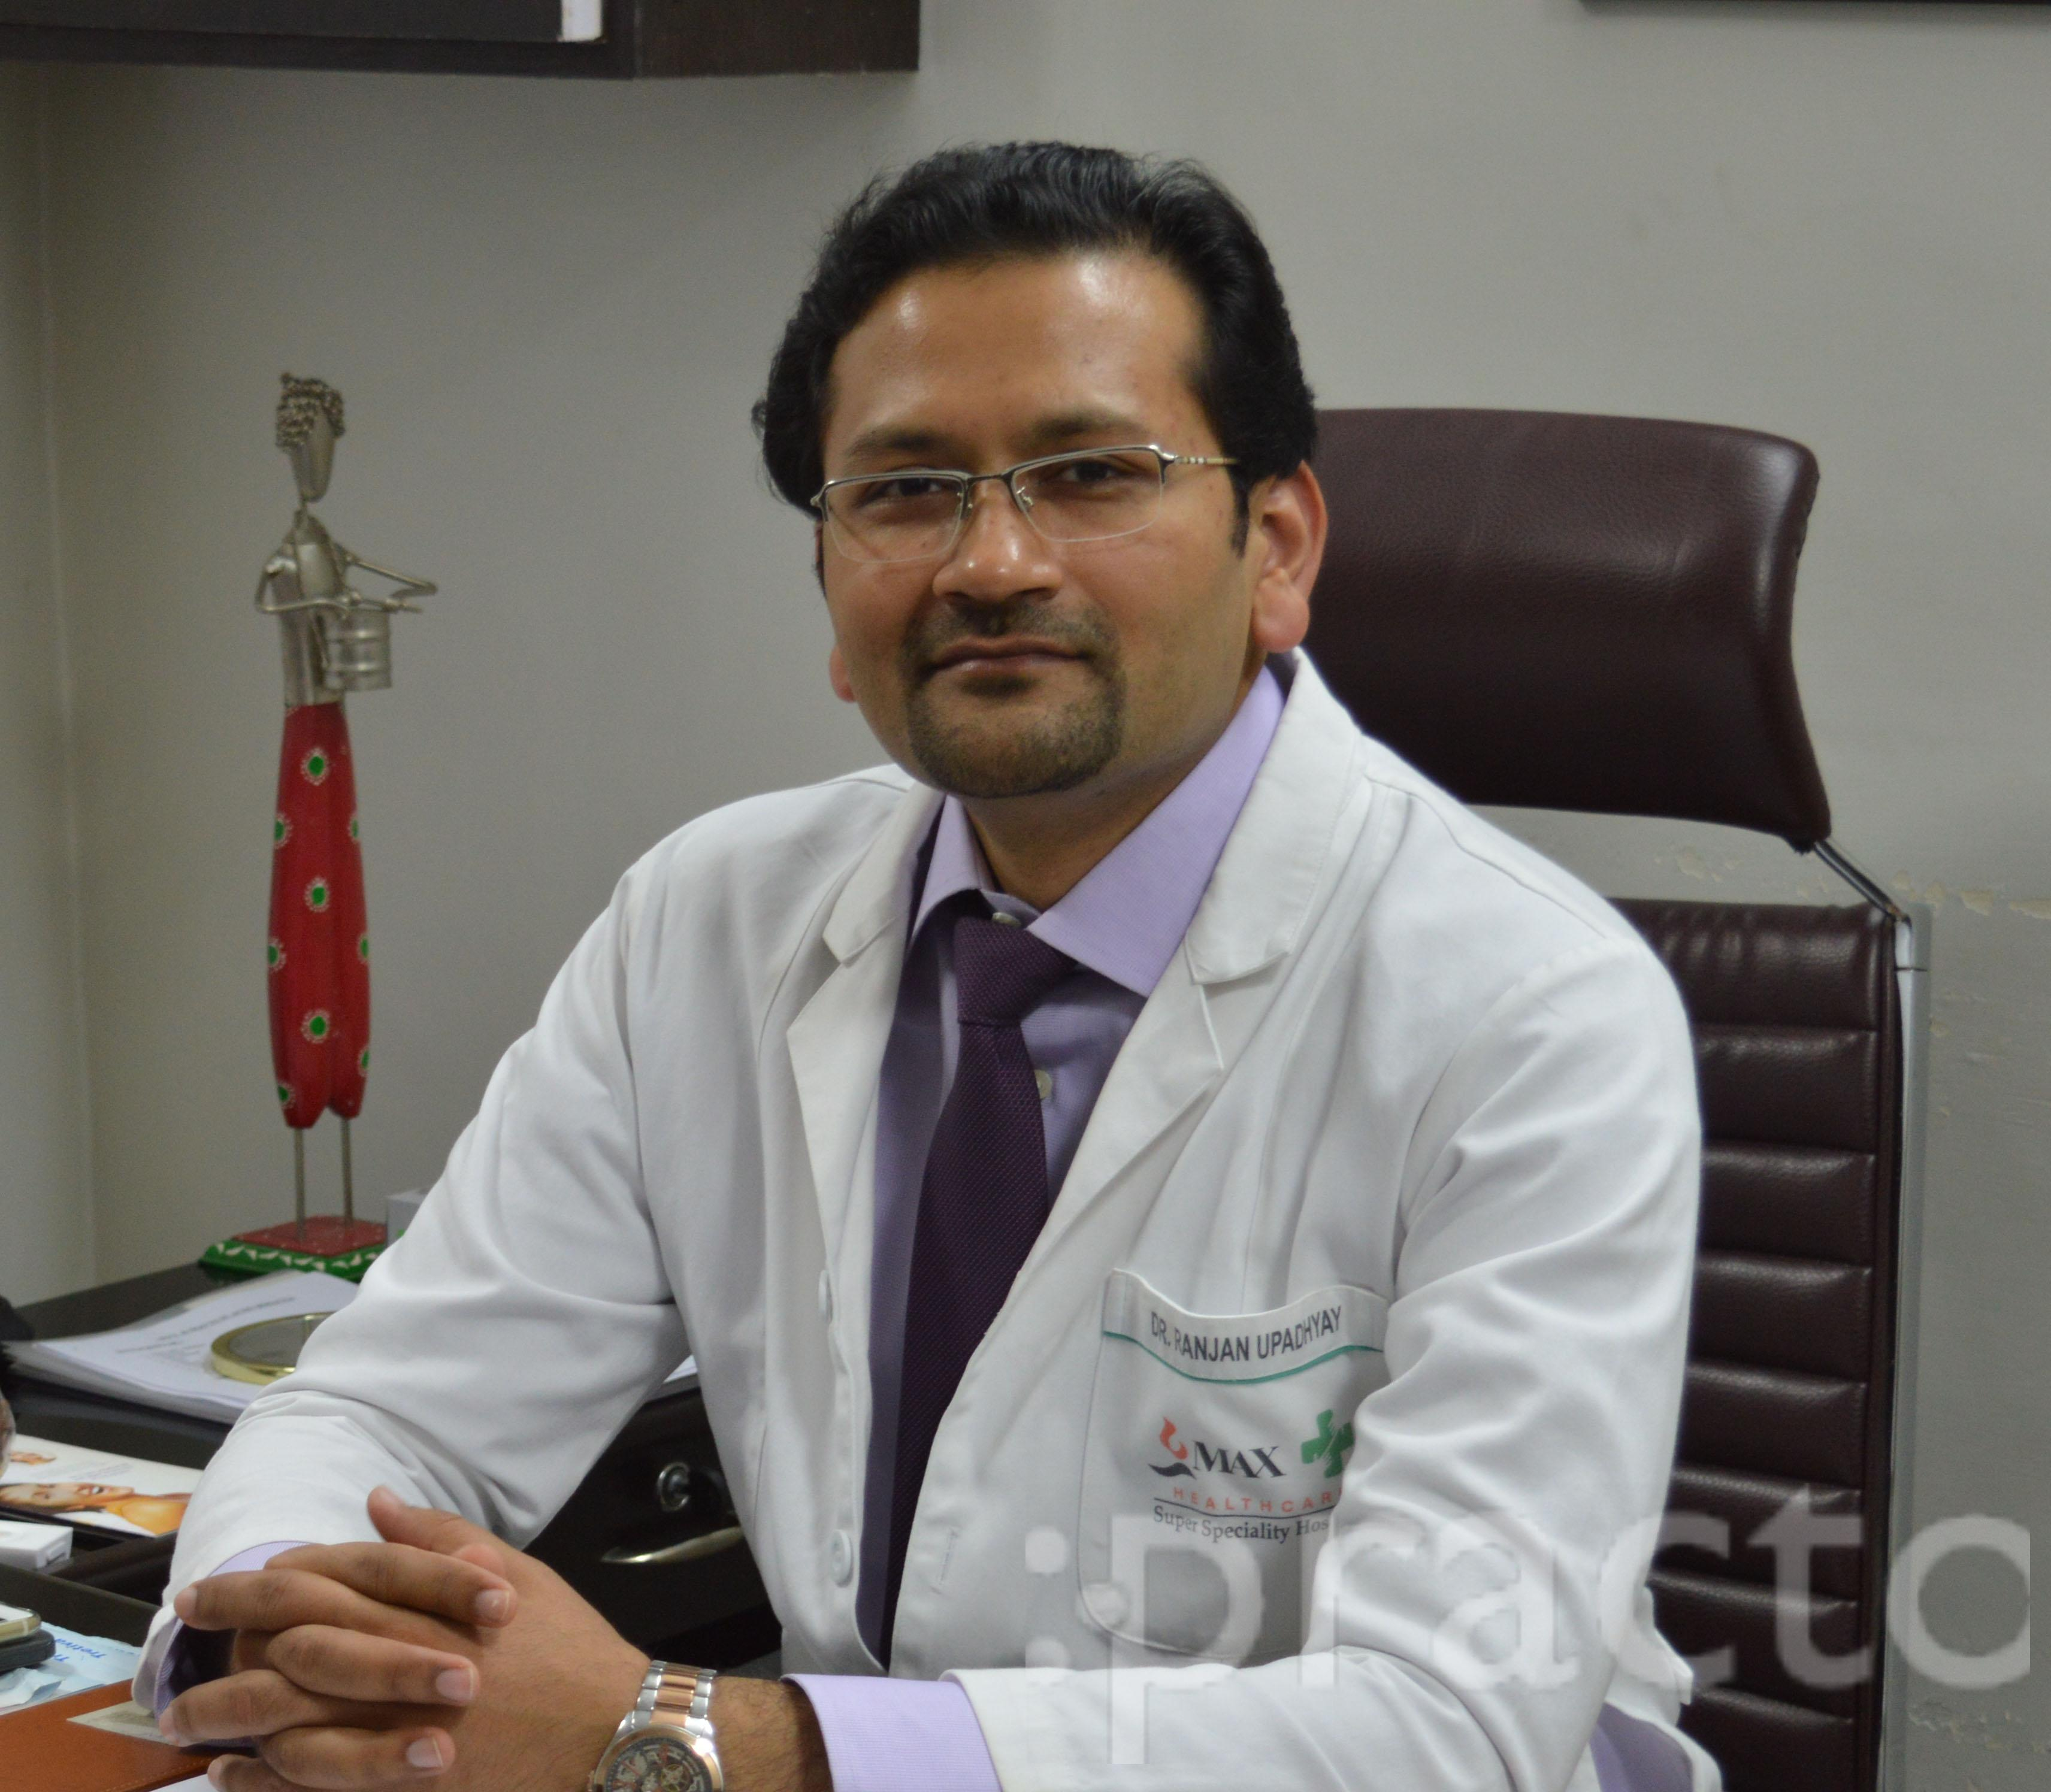 Dr. Ranjan Upadhyay - Cosmetologist